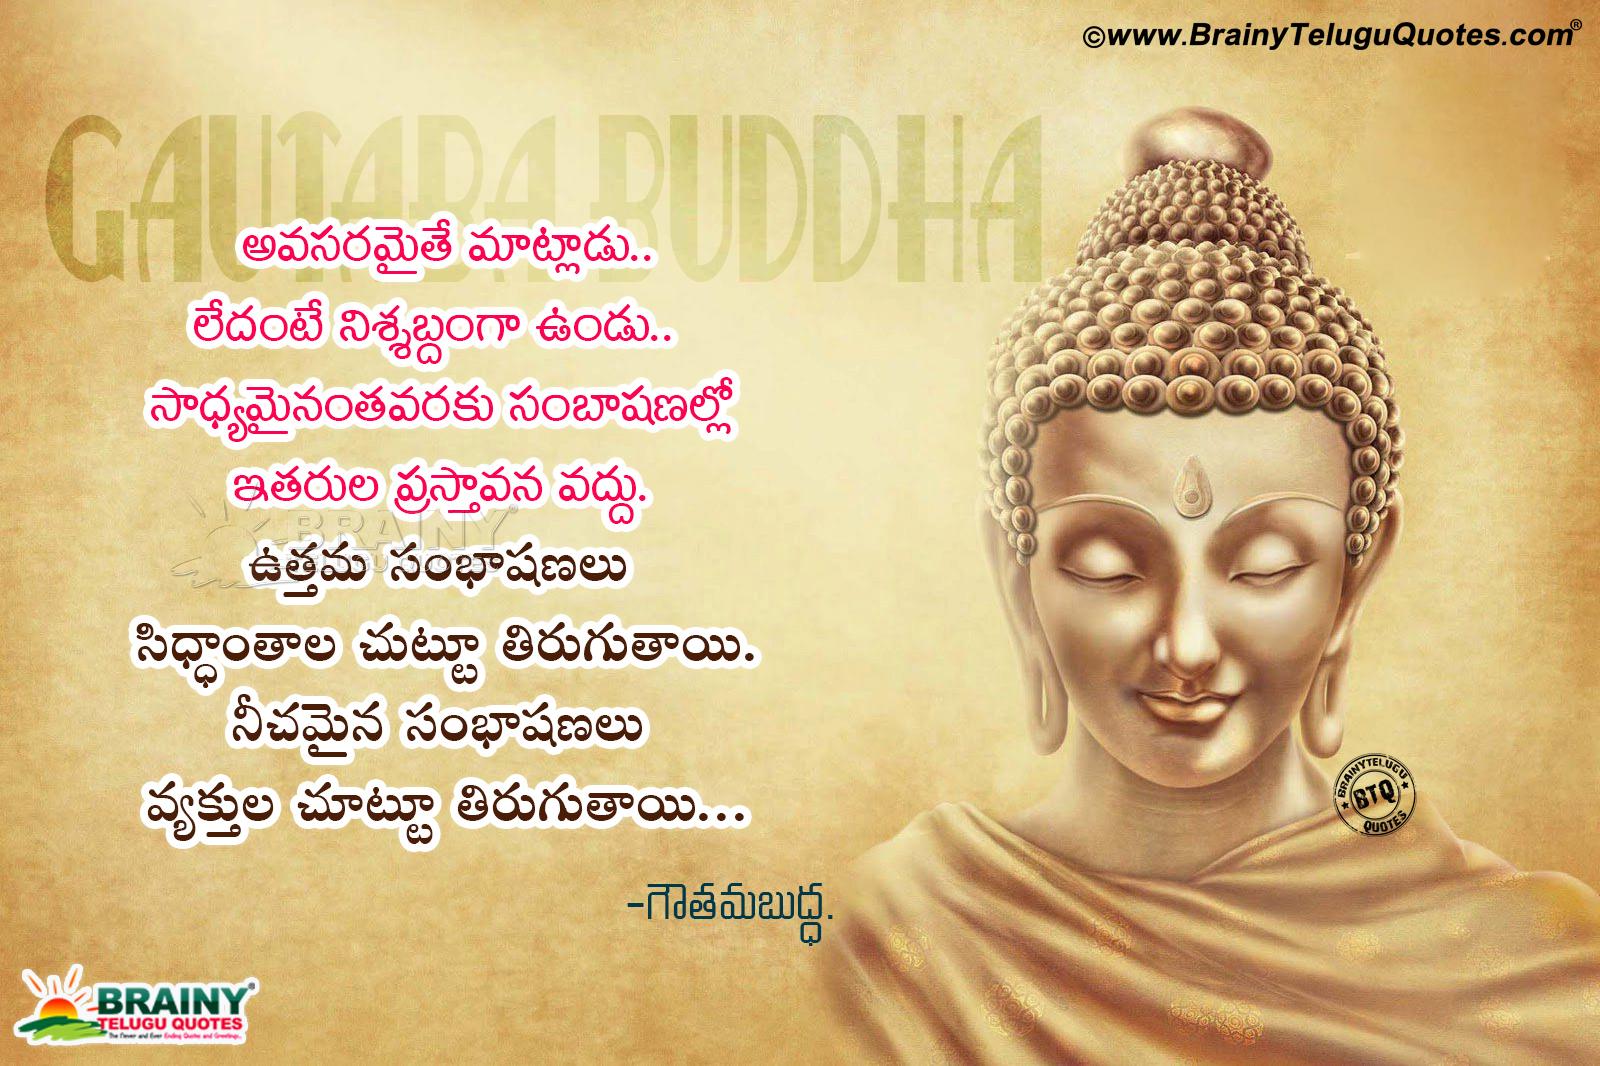 Gautama Buddha Quotes Telugu Gautama Buddha Inspirational Life Quotesbest Speeches